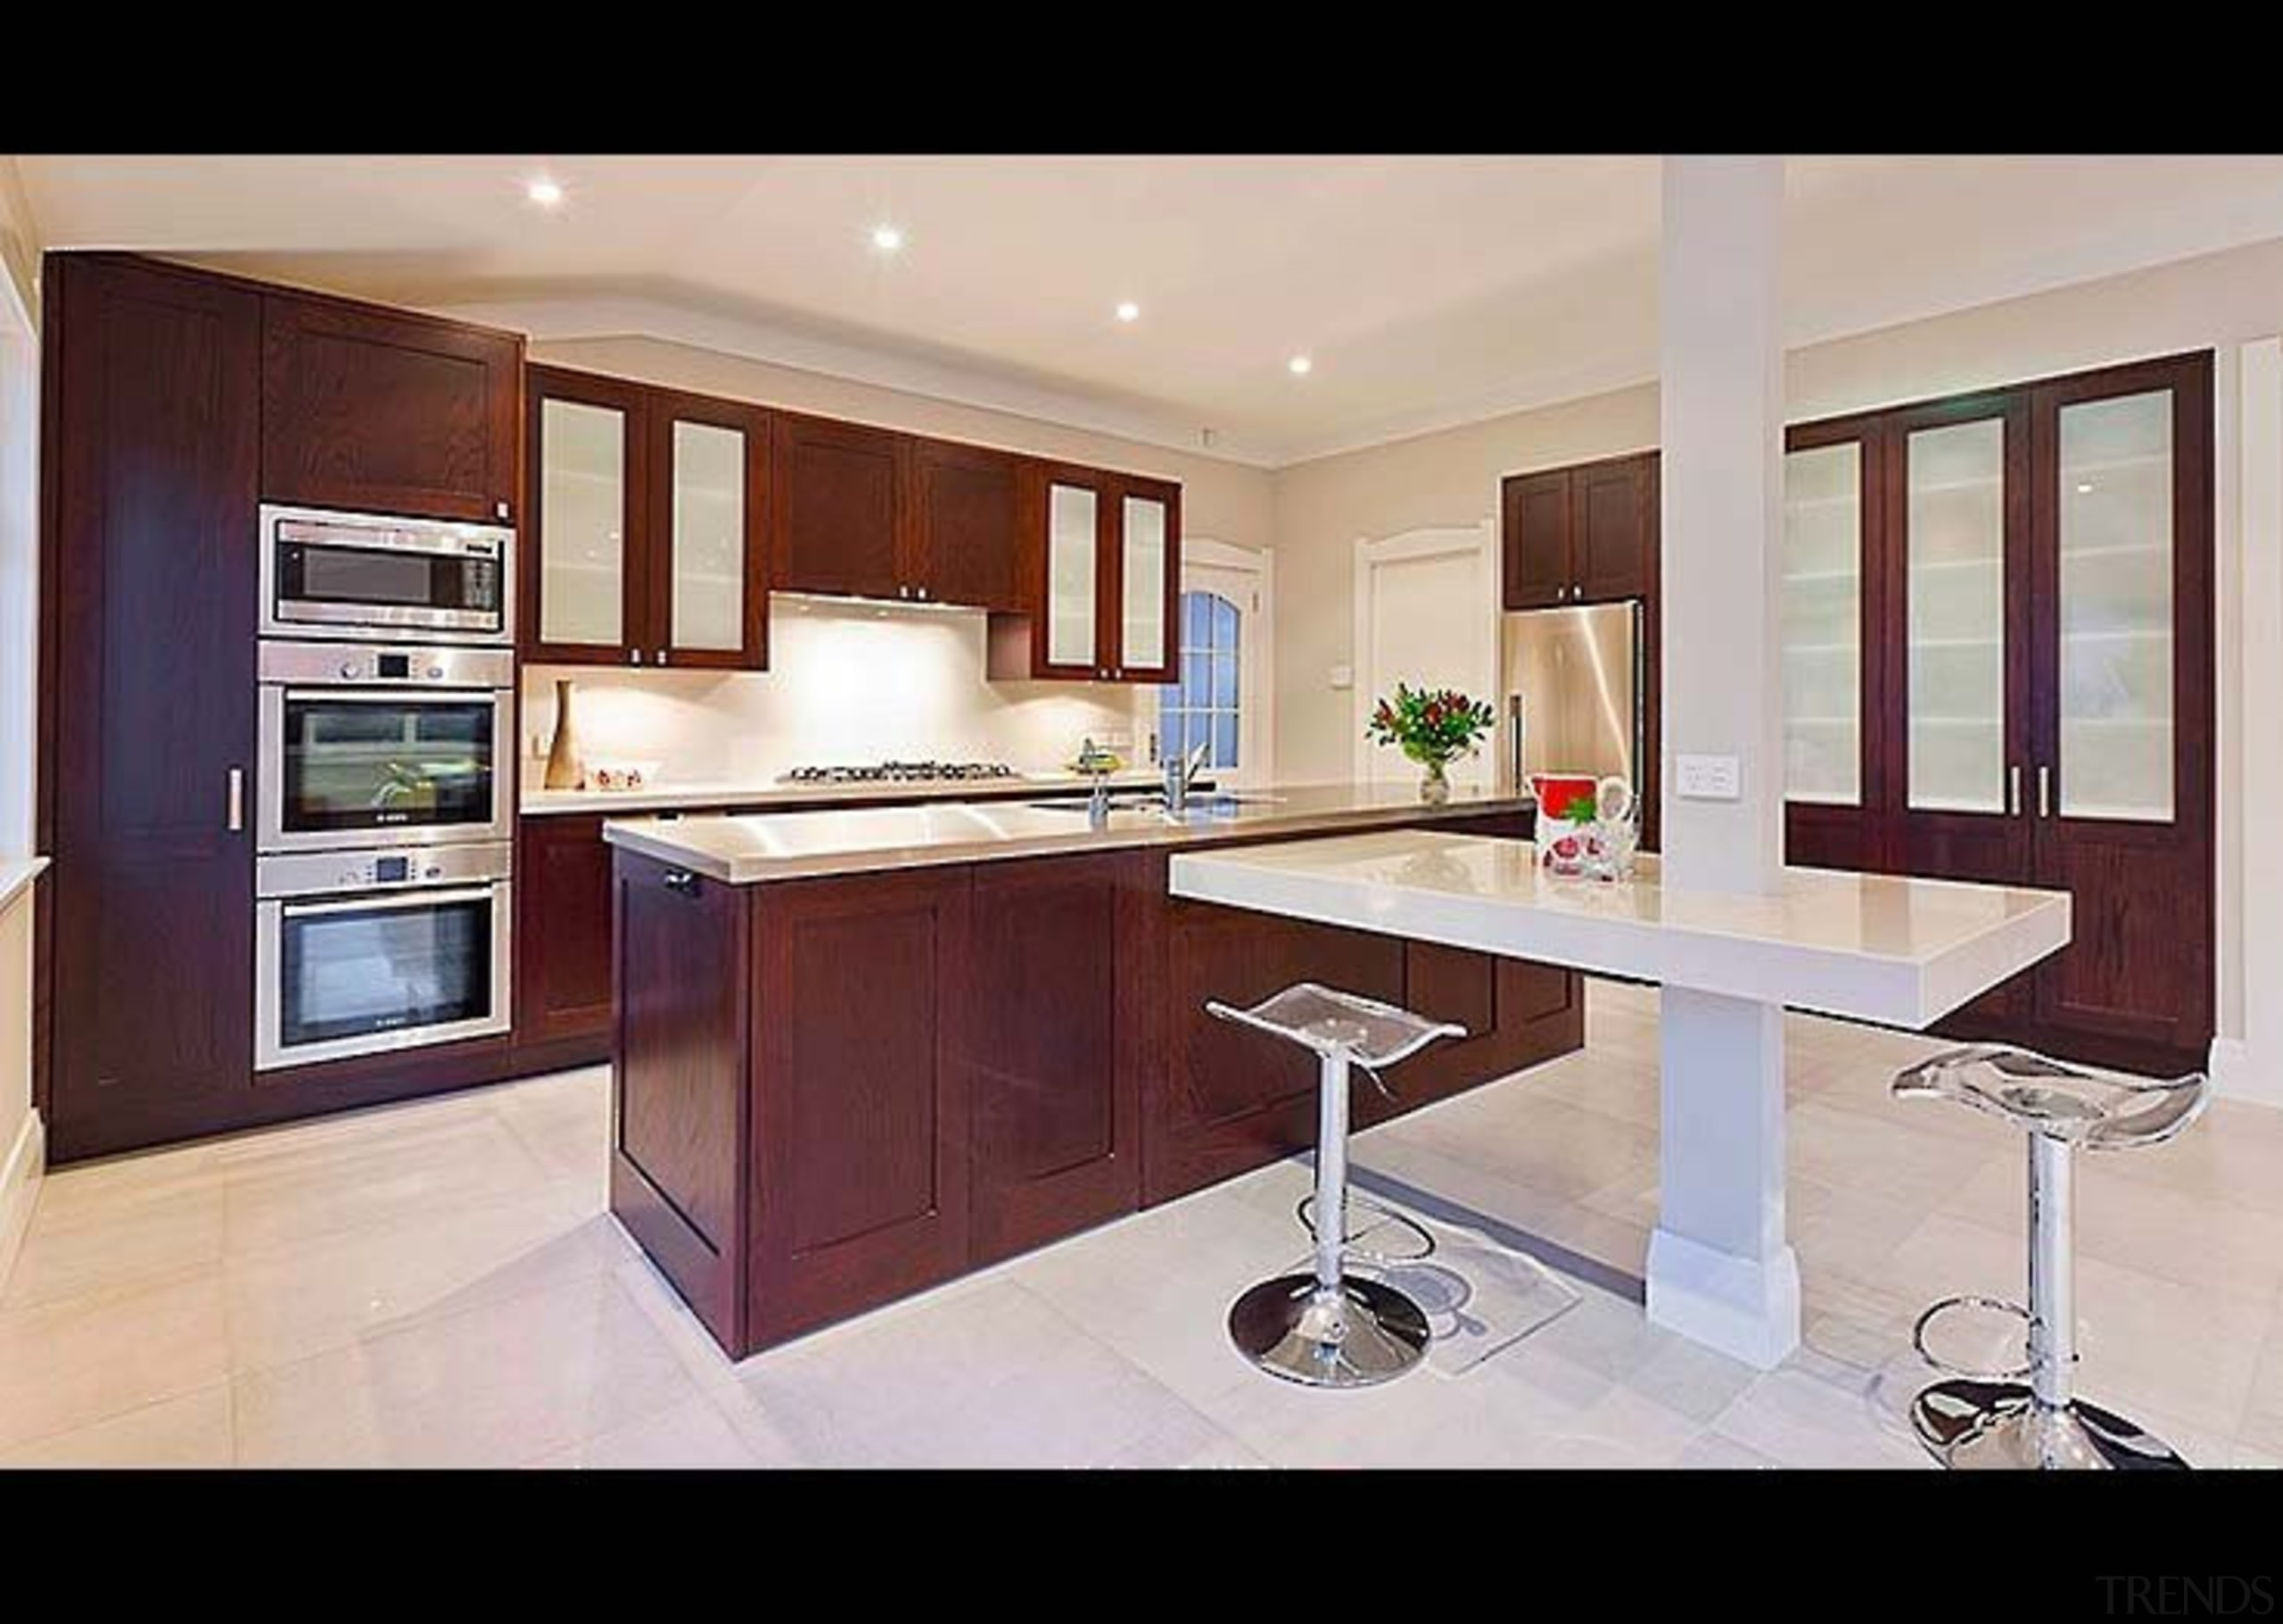 A Modern Twist - cabinetry   countertop   cabinetry, countertop, cuisine classique, furniture, interior design, kitchen, property, real estate, room, gray